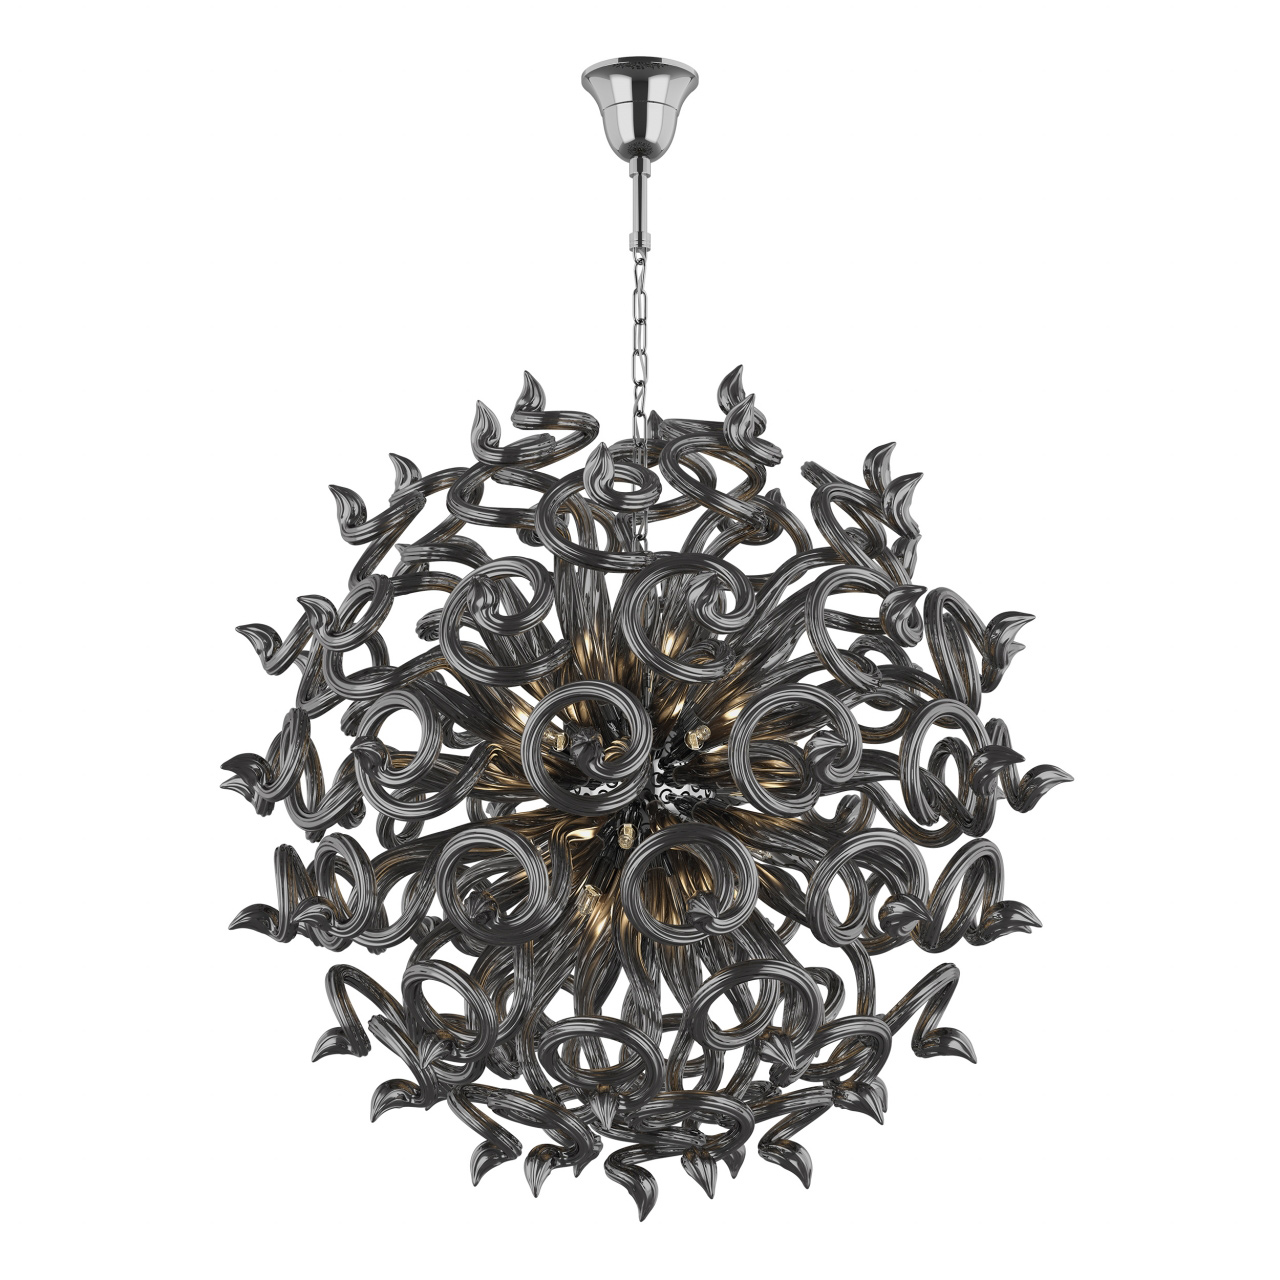 Люстра подвесная Medusa 18x40W G9 темно серый / серый Lightstar 890187